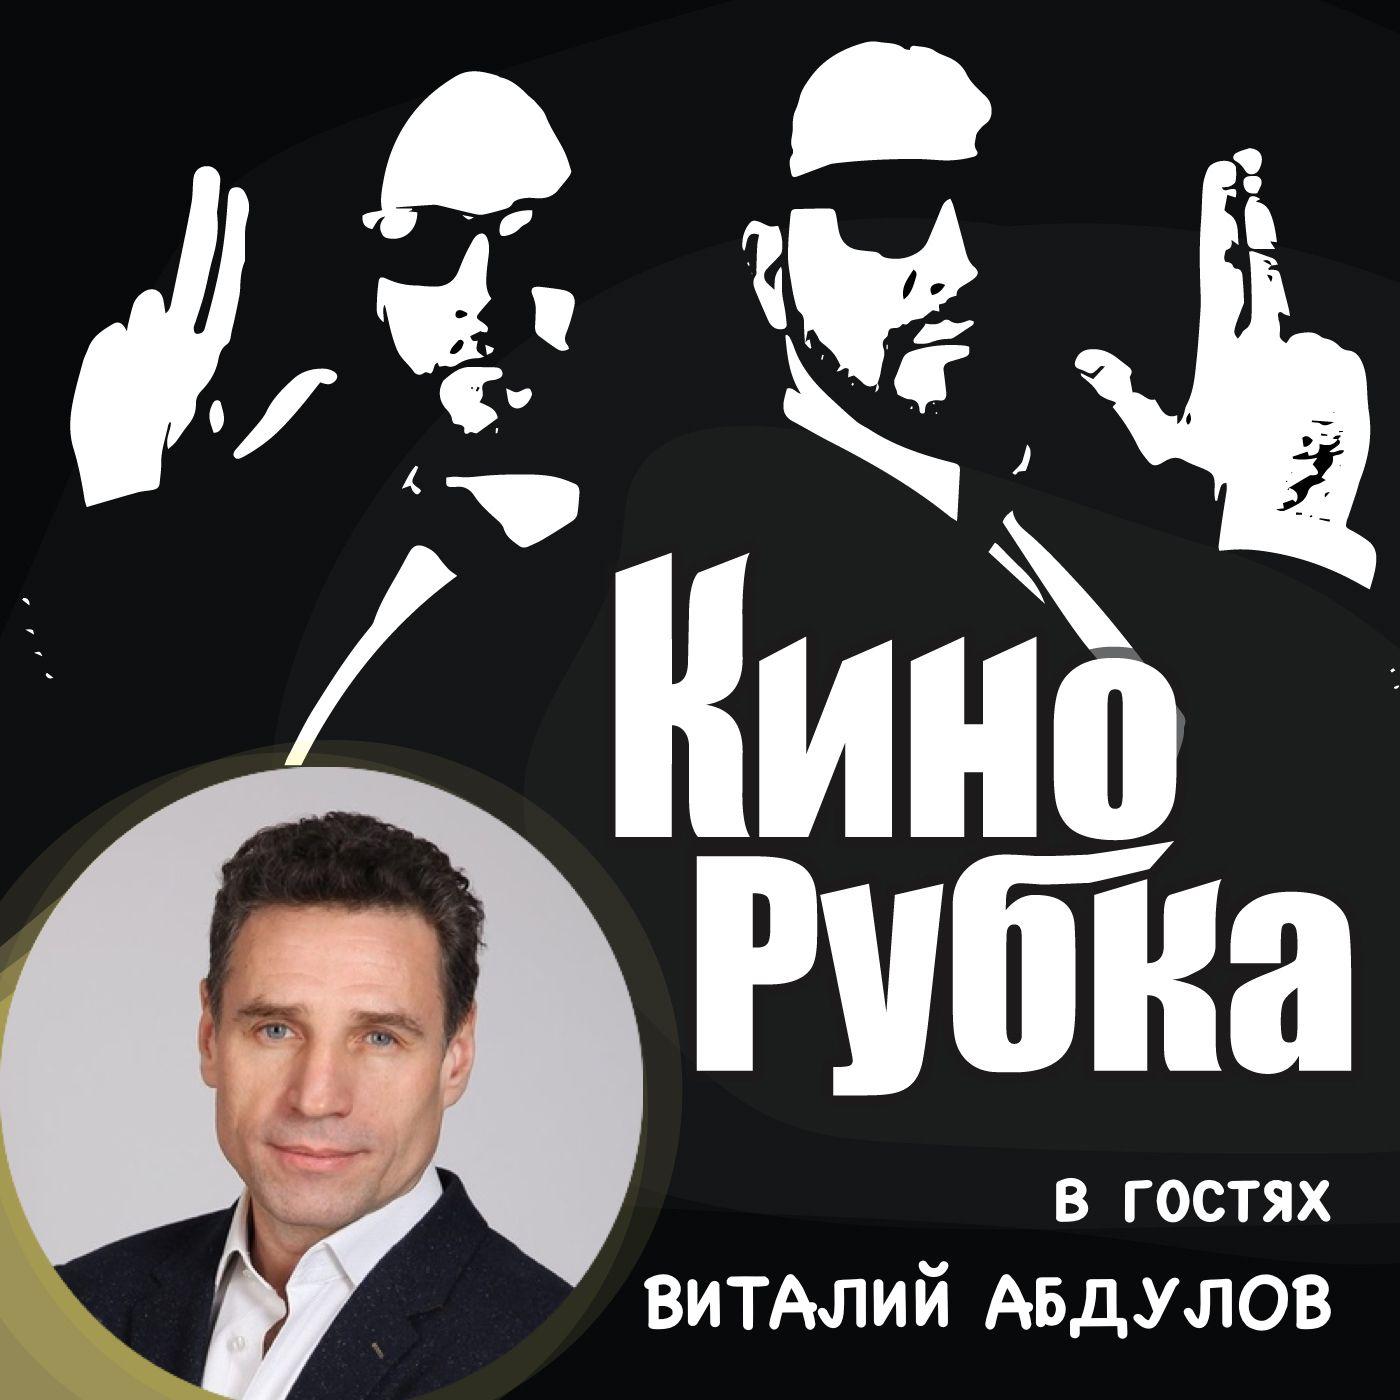 Павел Дикан Актер театра и кино Виталий Абдулов павел дикан актер театра и кино николай цонку